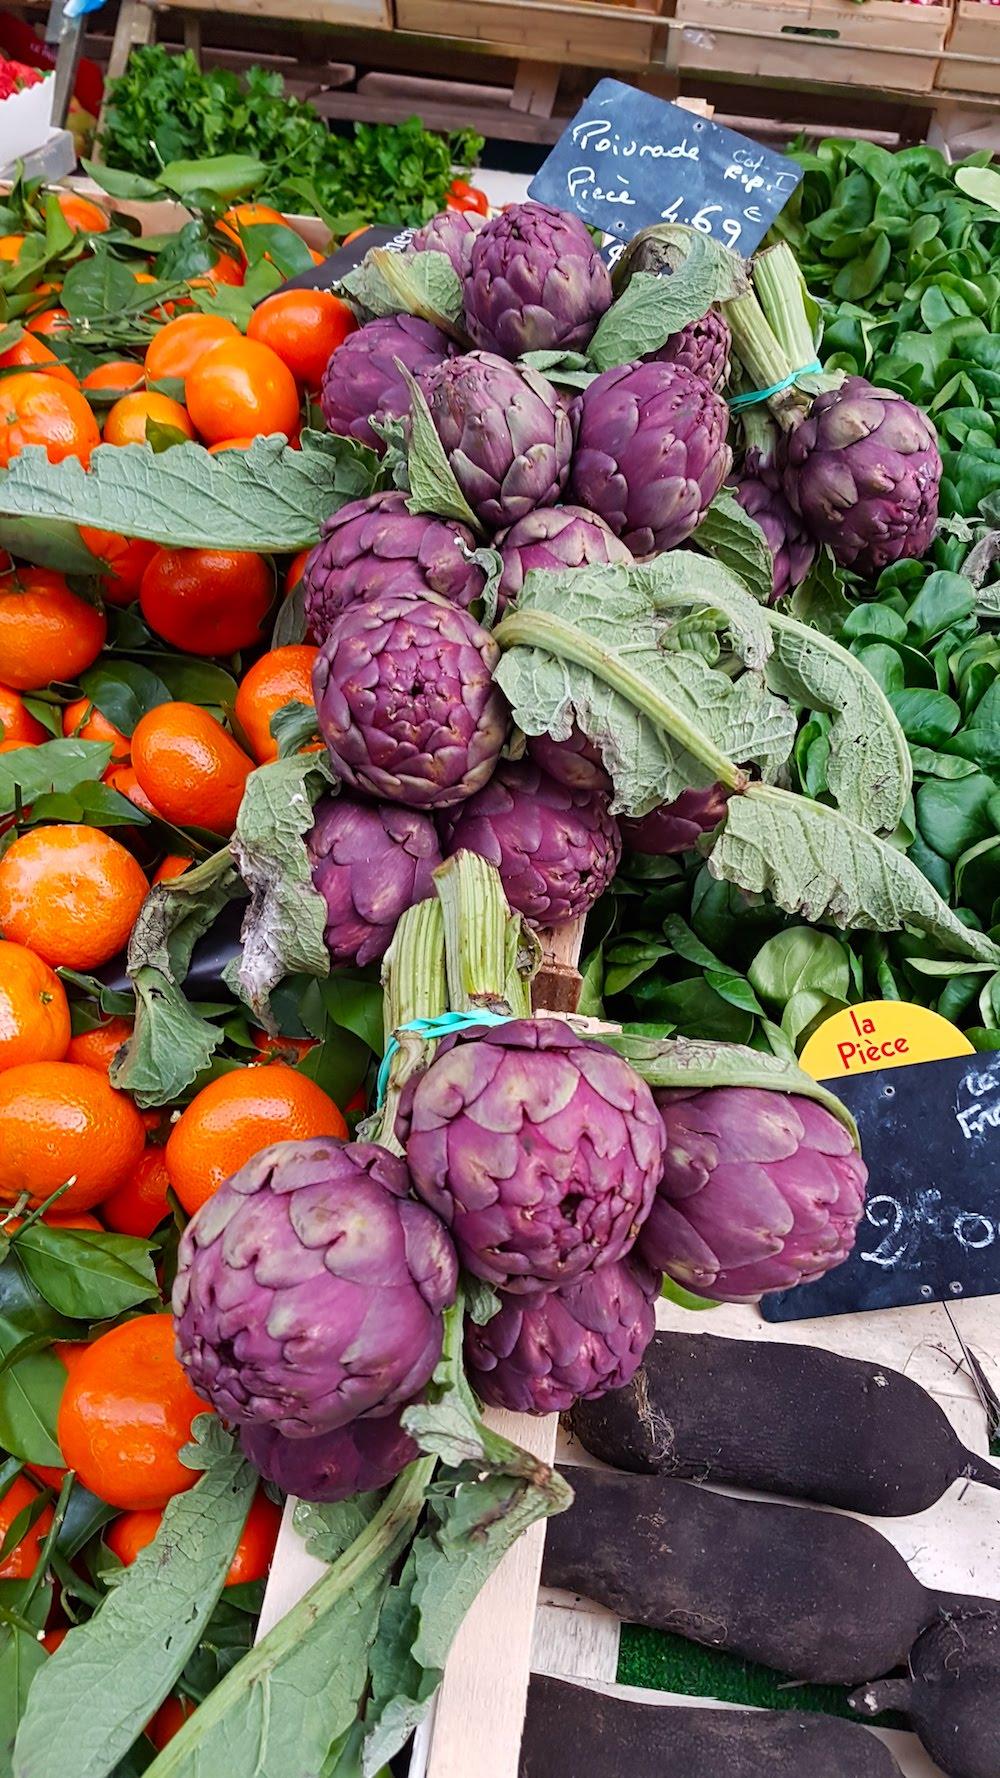 Artichokes, veggies and beets